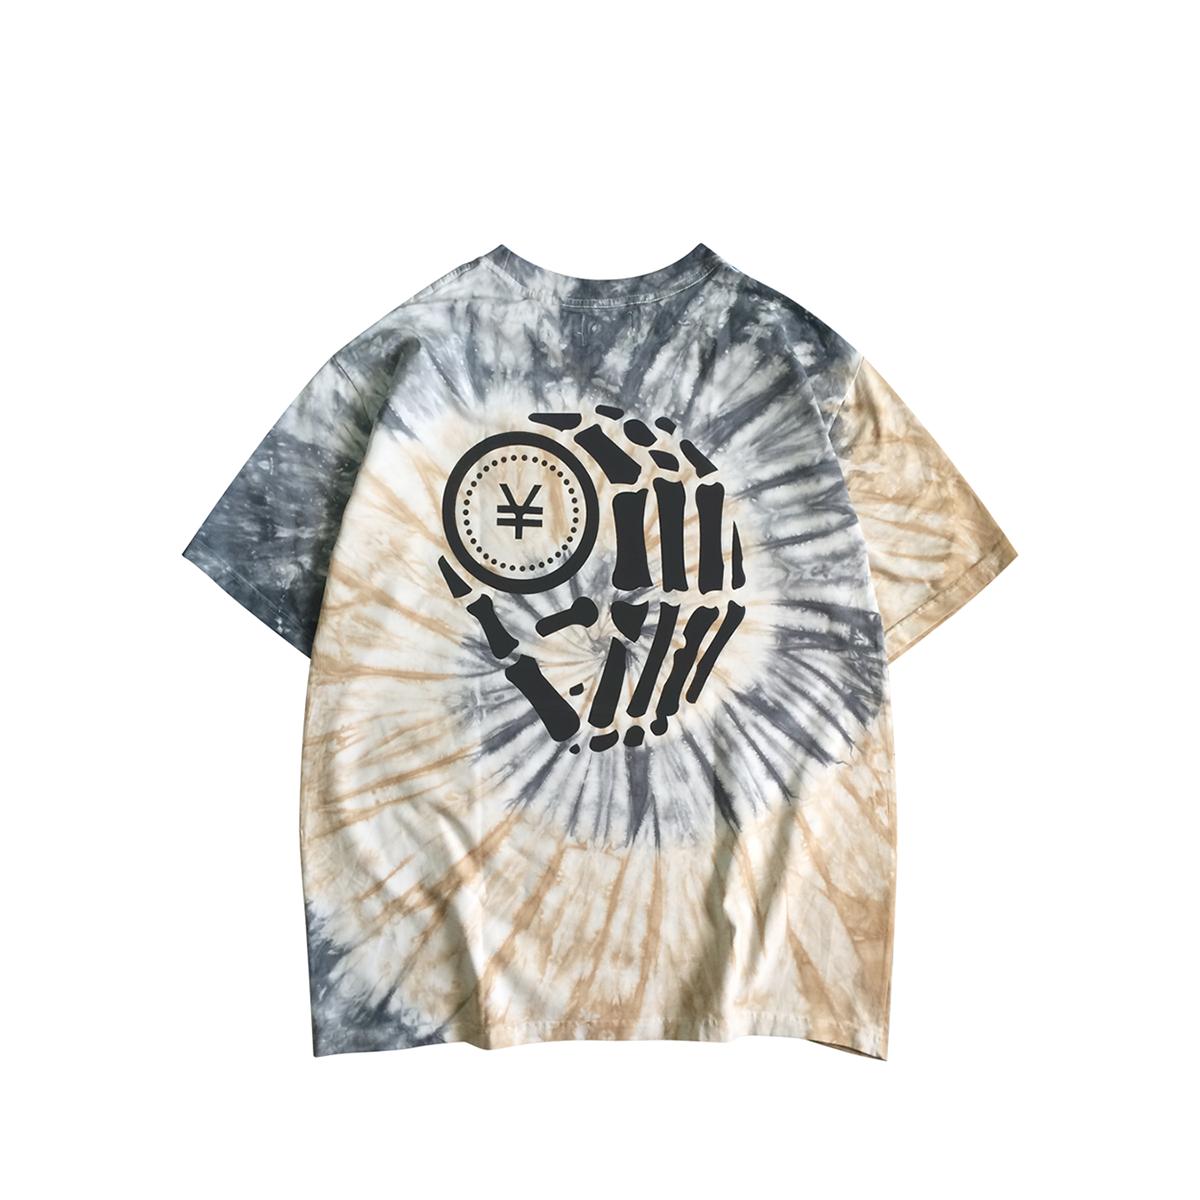 Hologram Jupiter Tie-dye T-shirt